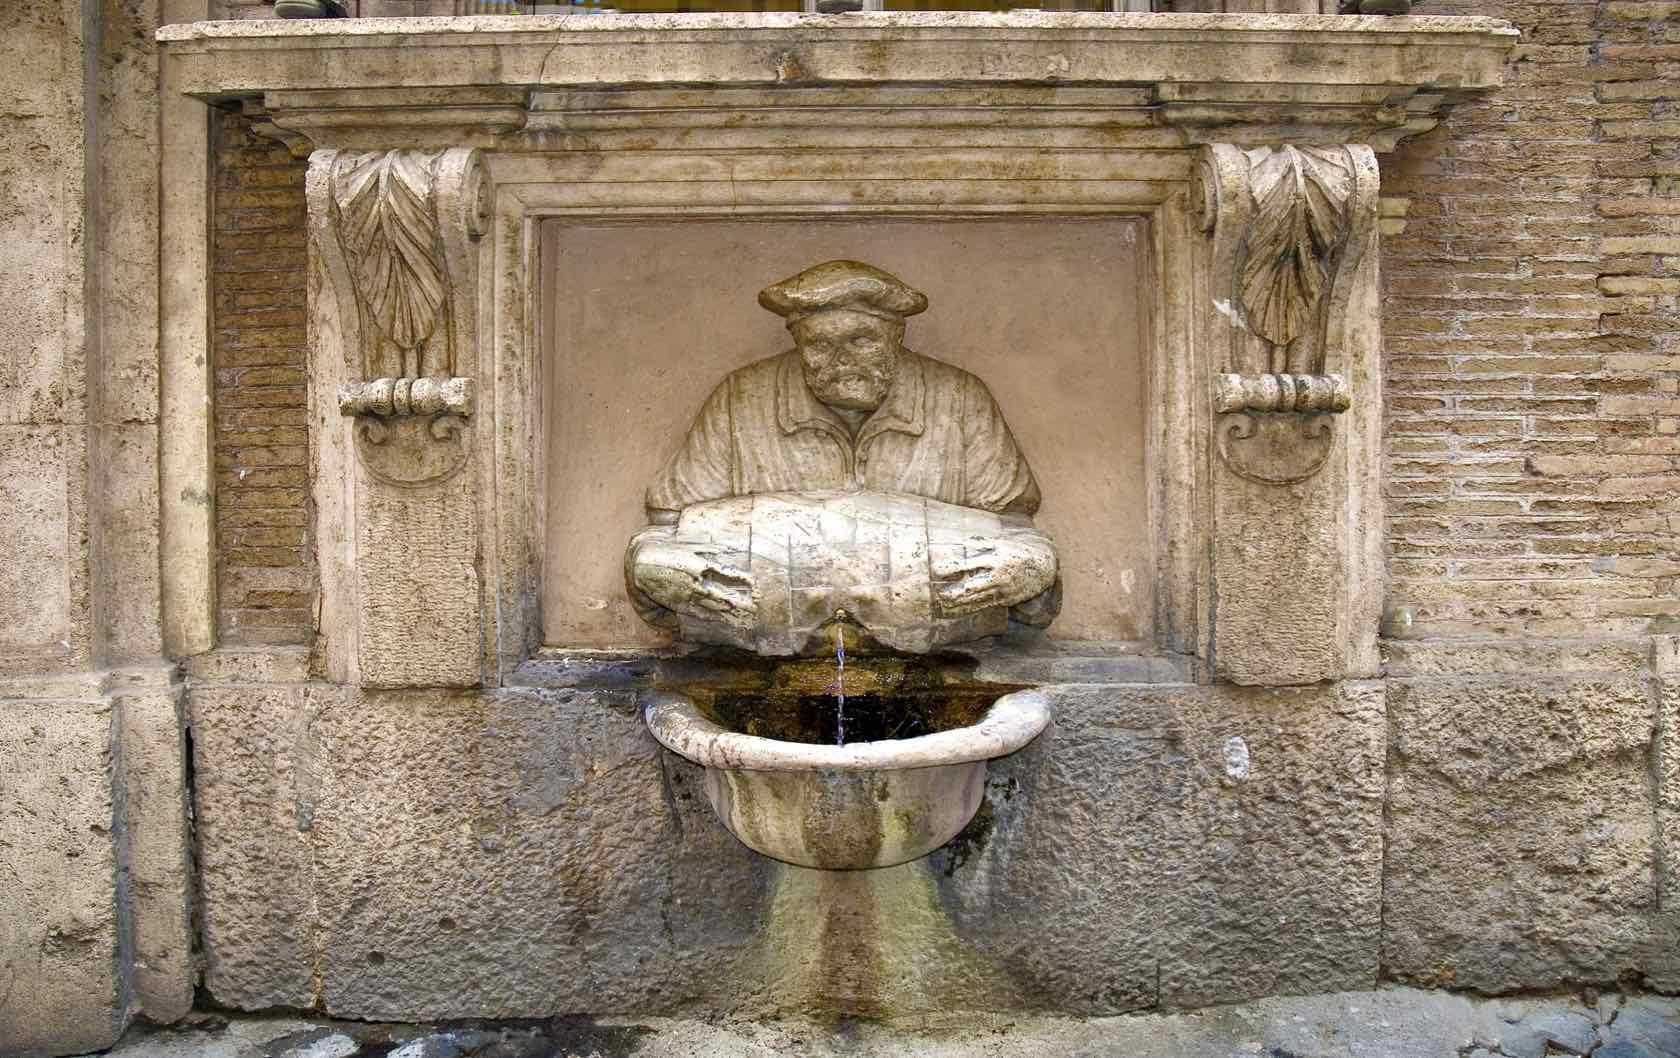 Fountain of the Facchino fountains in Rome